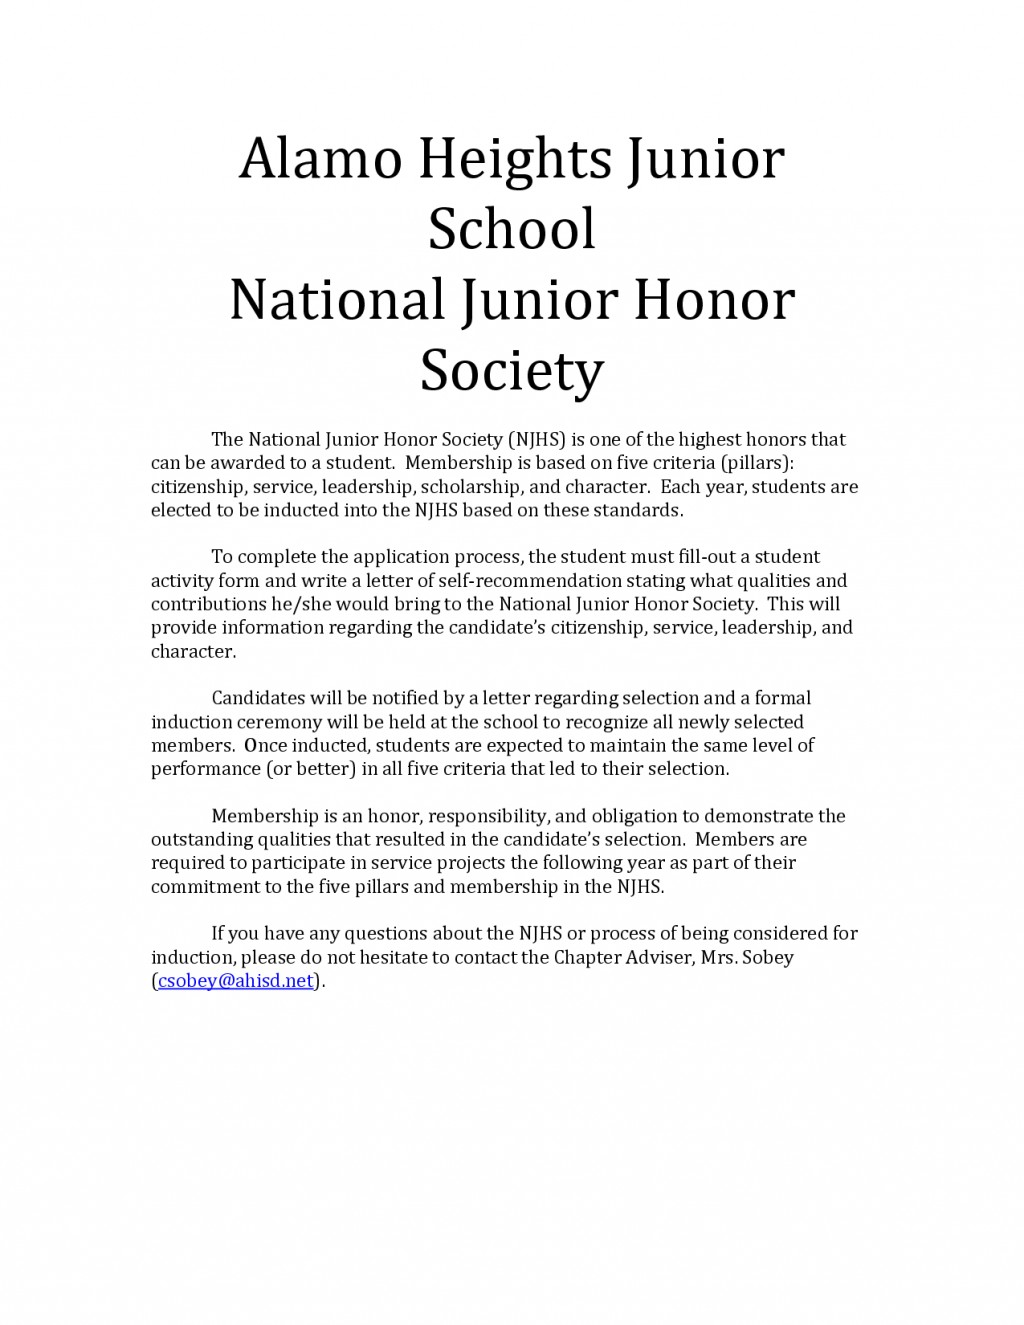 005 National Honor Society Application Essay Example Sensational Examples Service Junior Scholarship Large